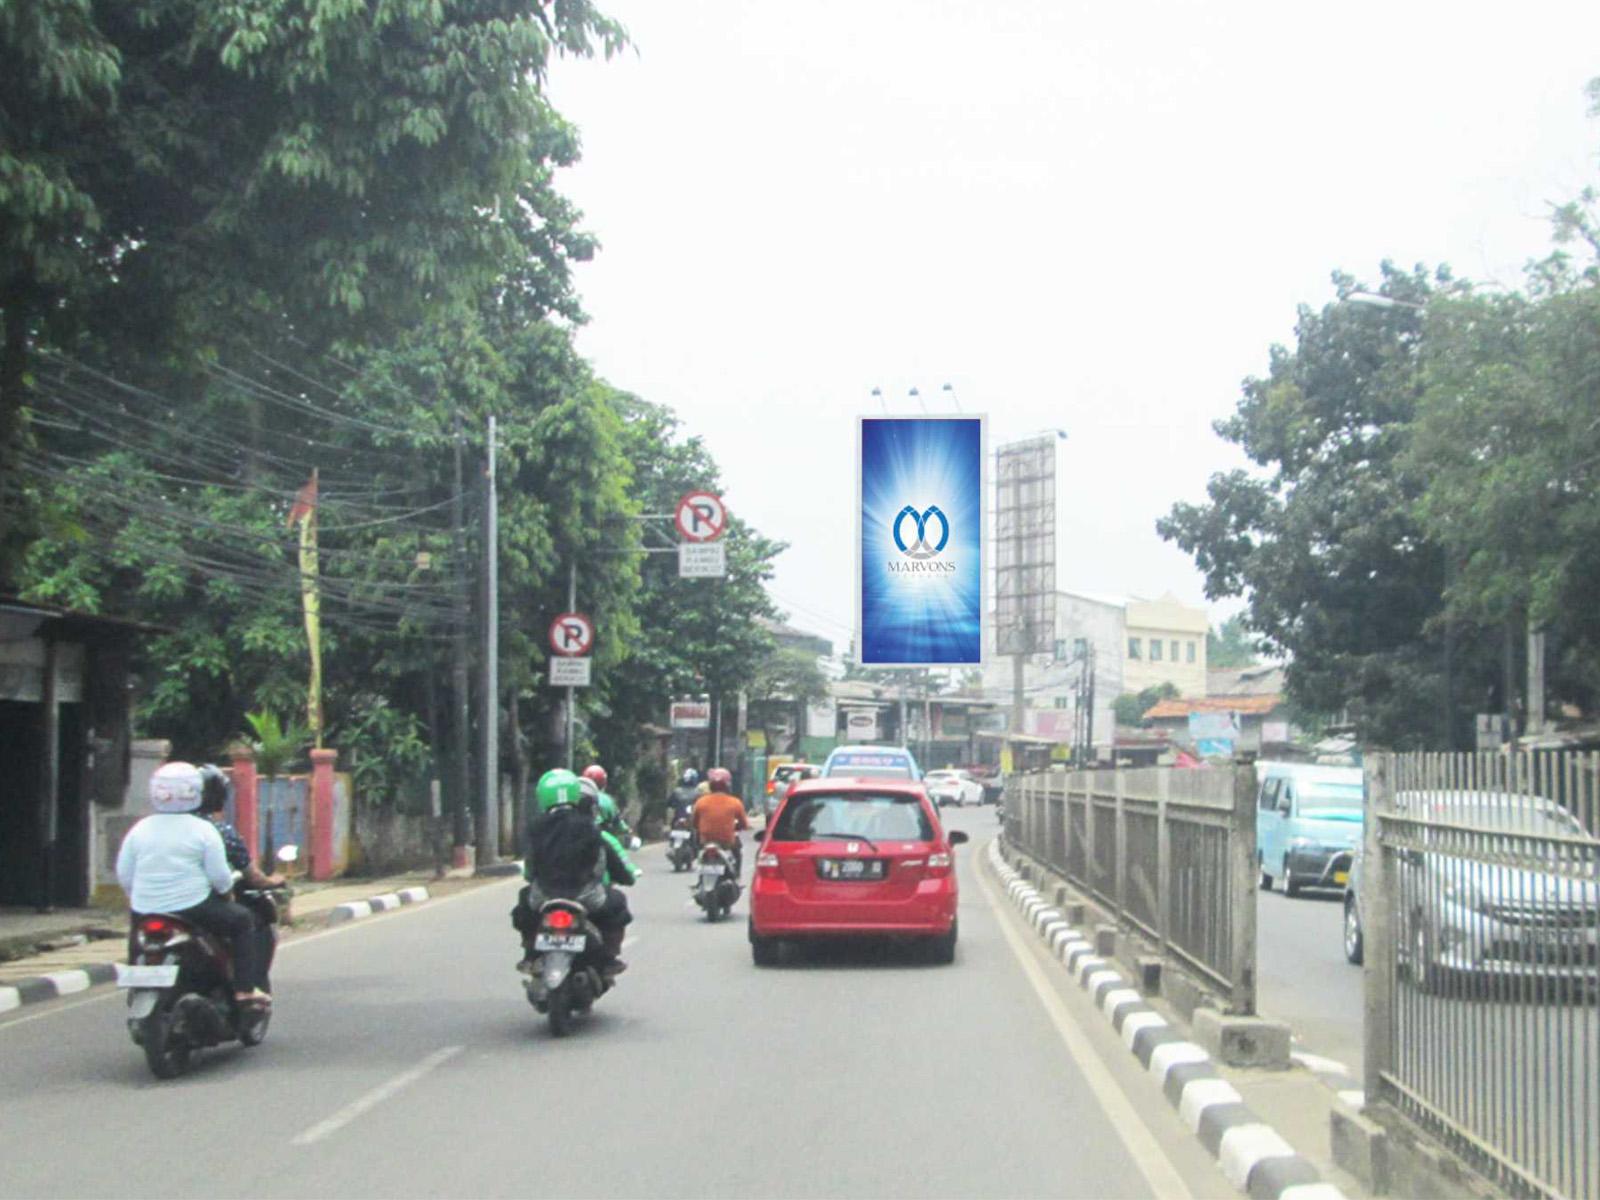 PT. Marvons Media Utama - Raya Bogor Kramat Jati (MV 109) - 5 m x 10 m x 1 mk Vertikal